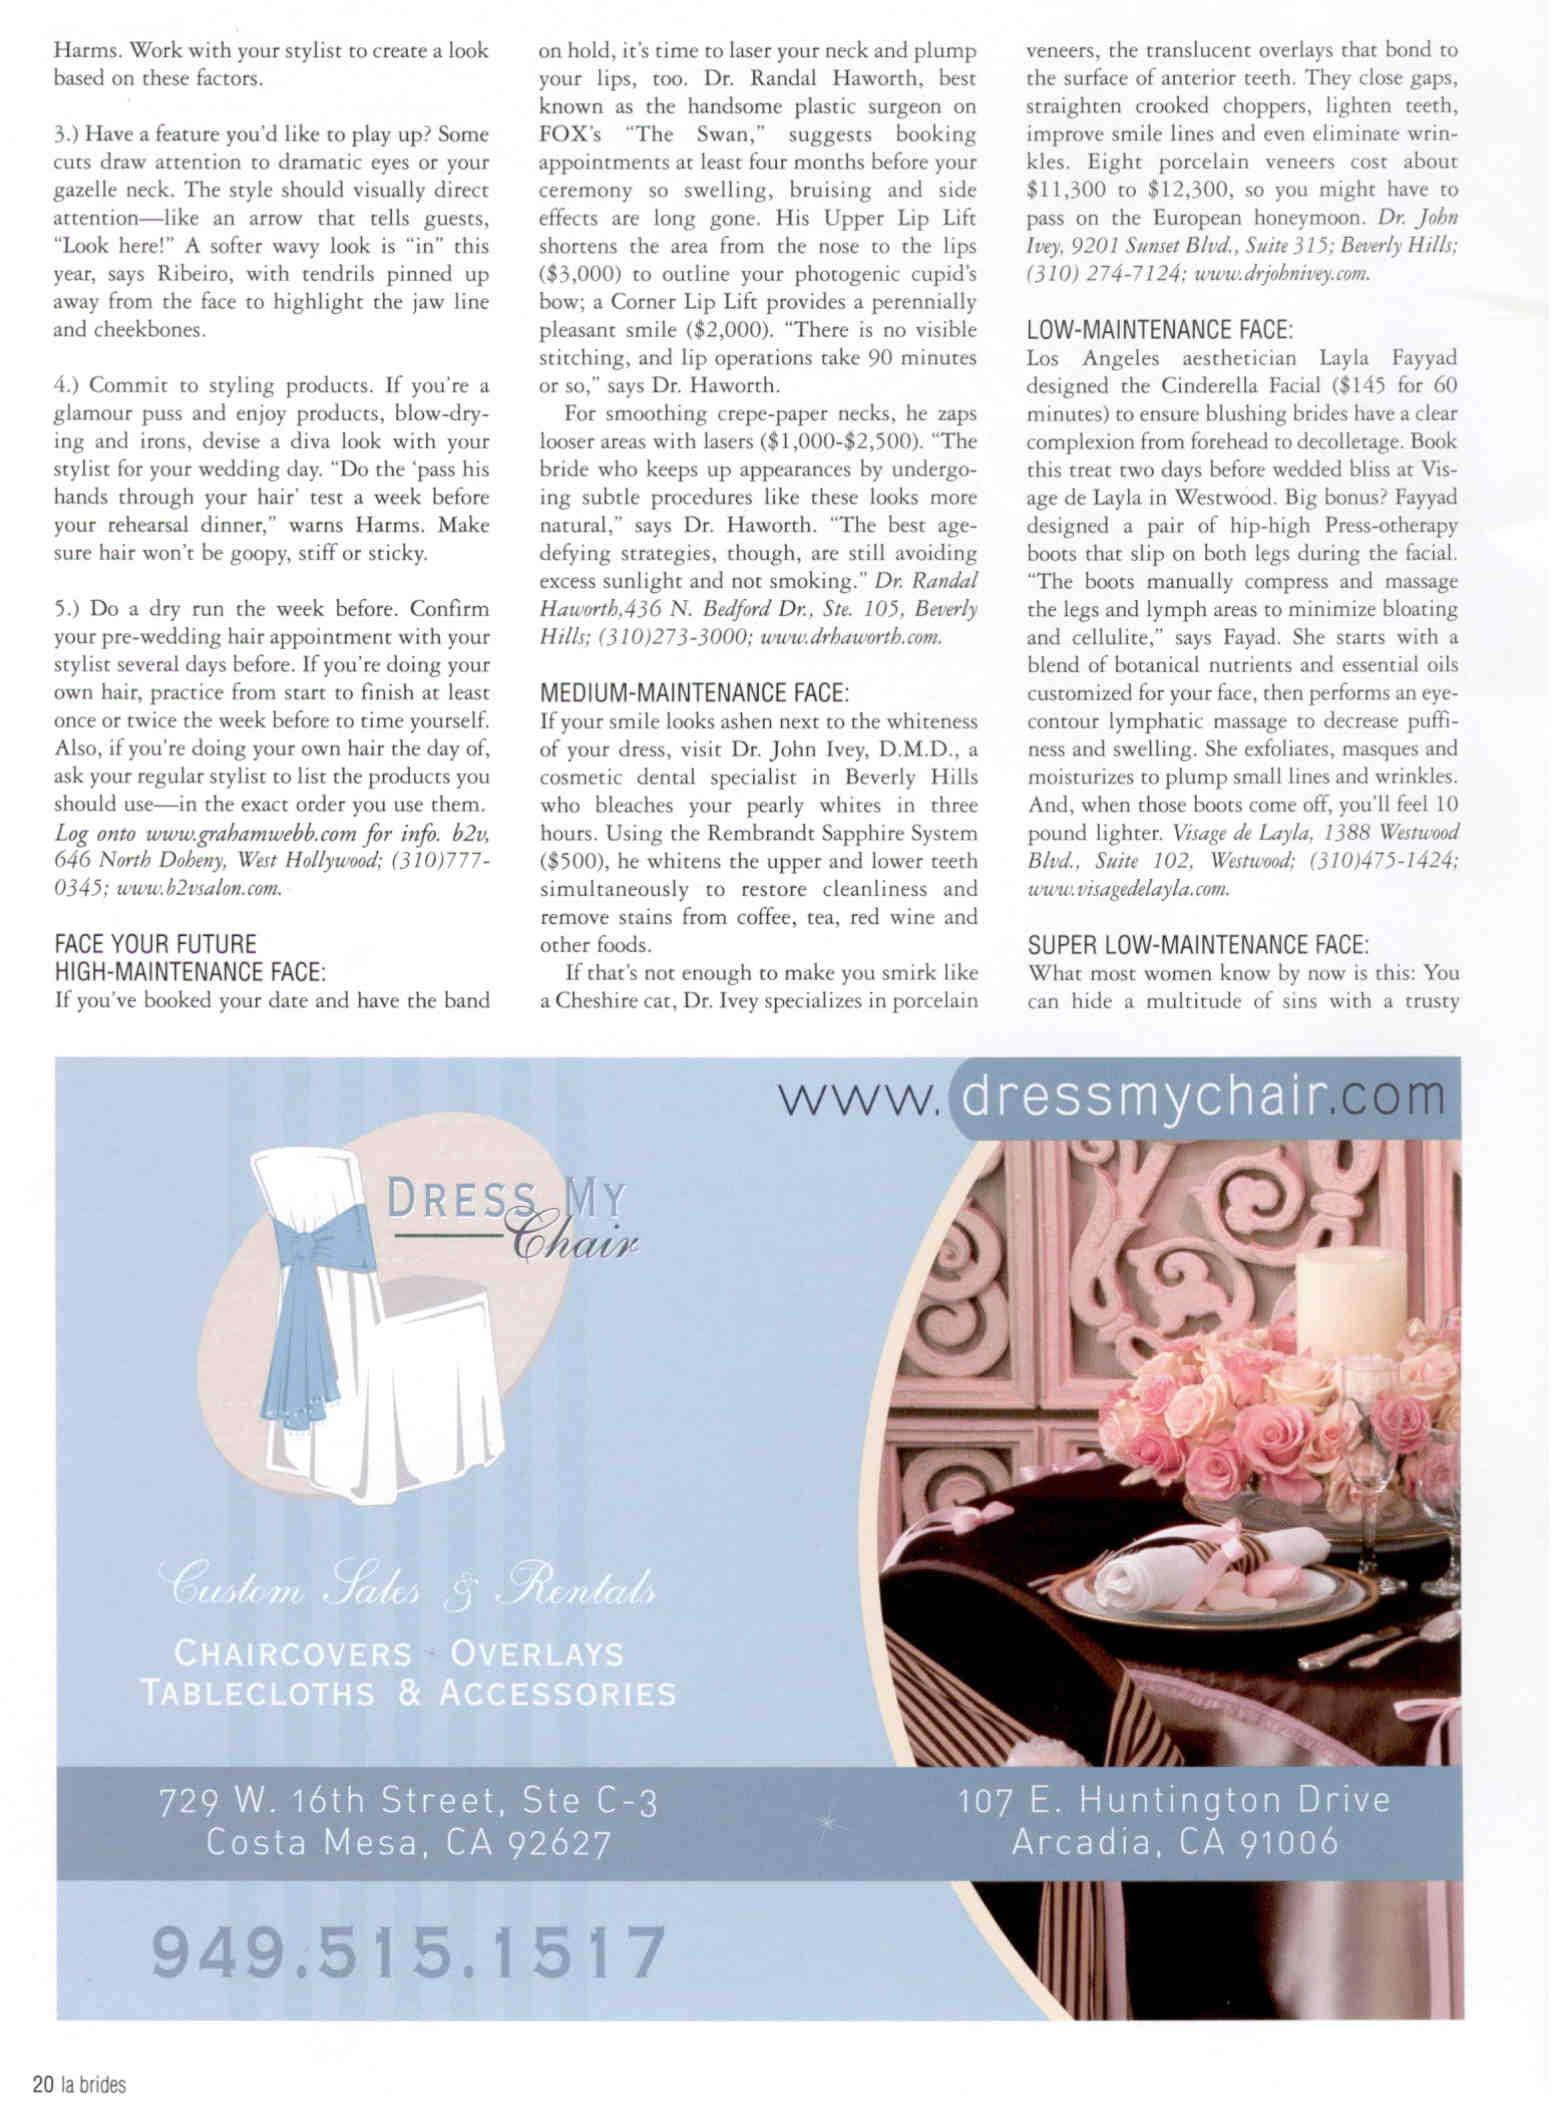 Press Article Image